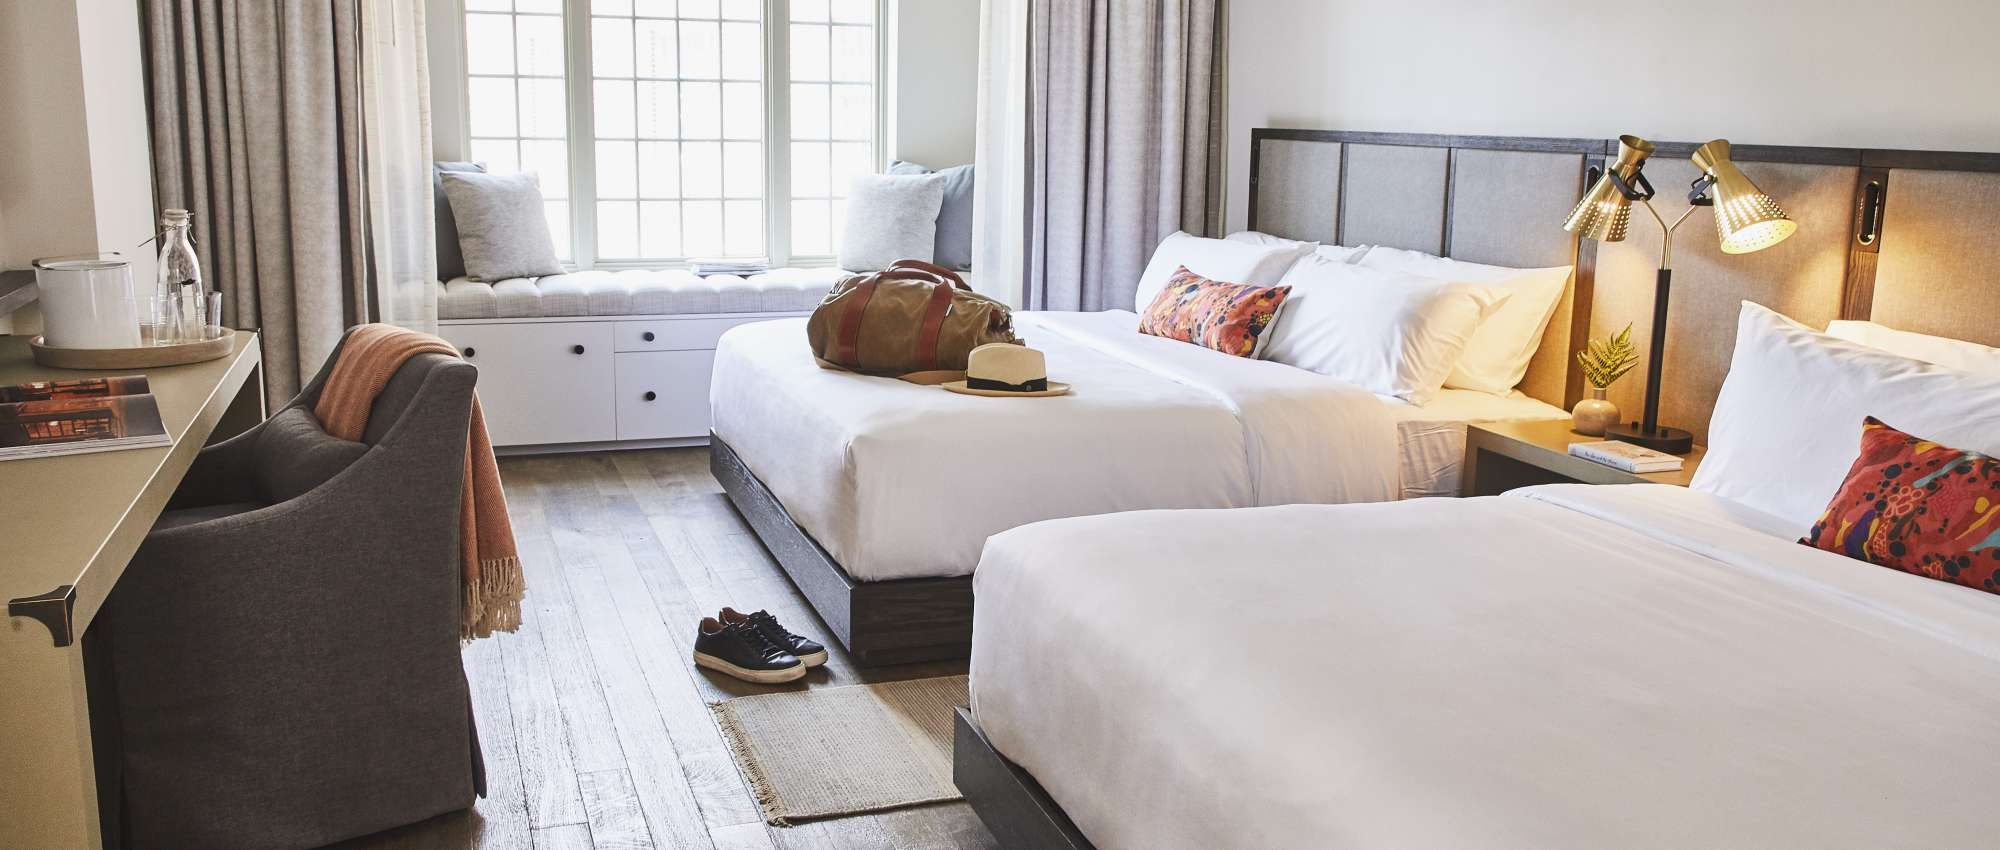 Guest room at The Alida, Savannah, a Tribute Portfolio Hotel